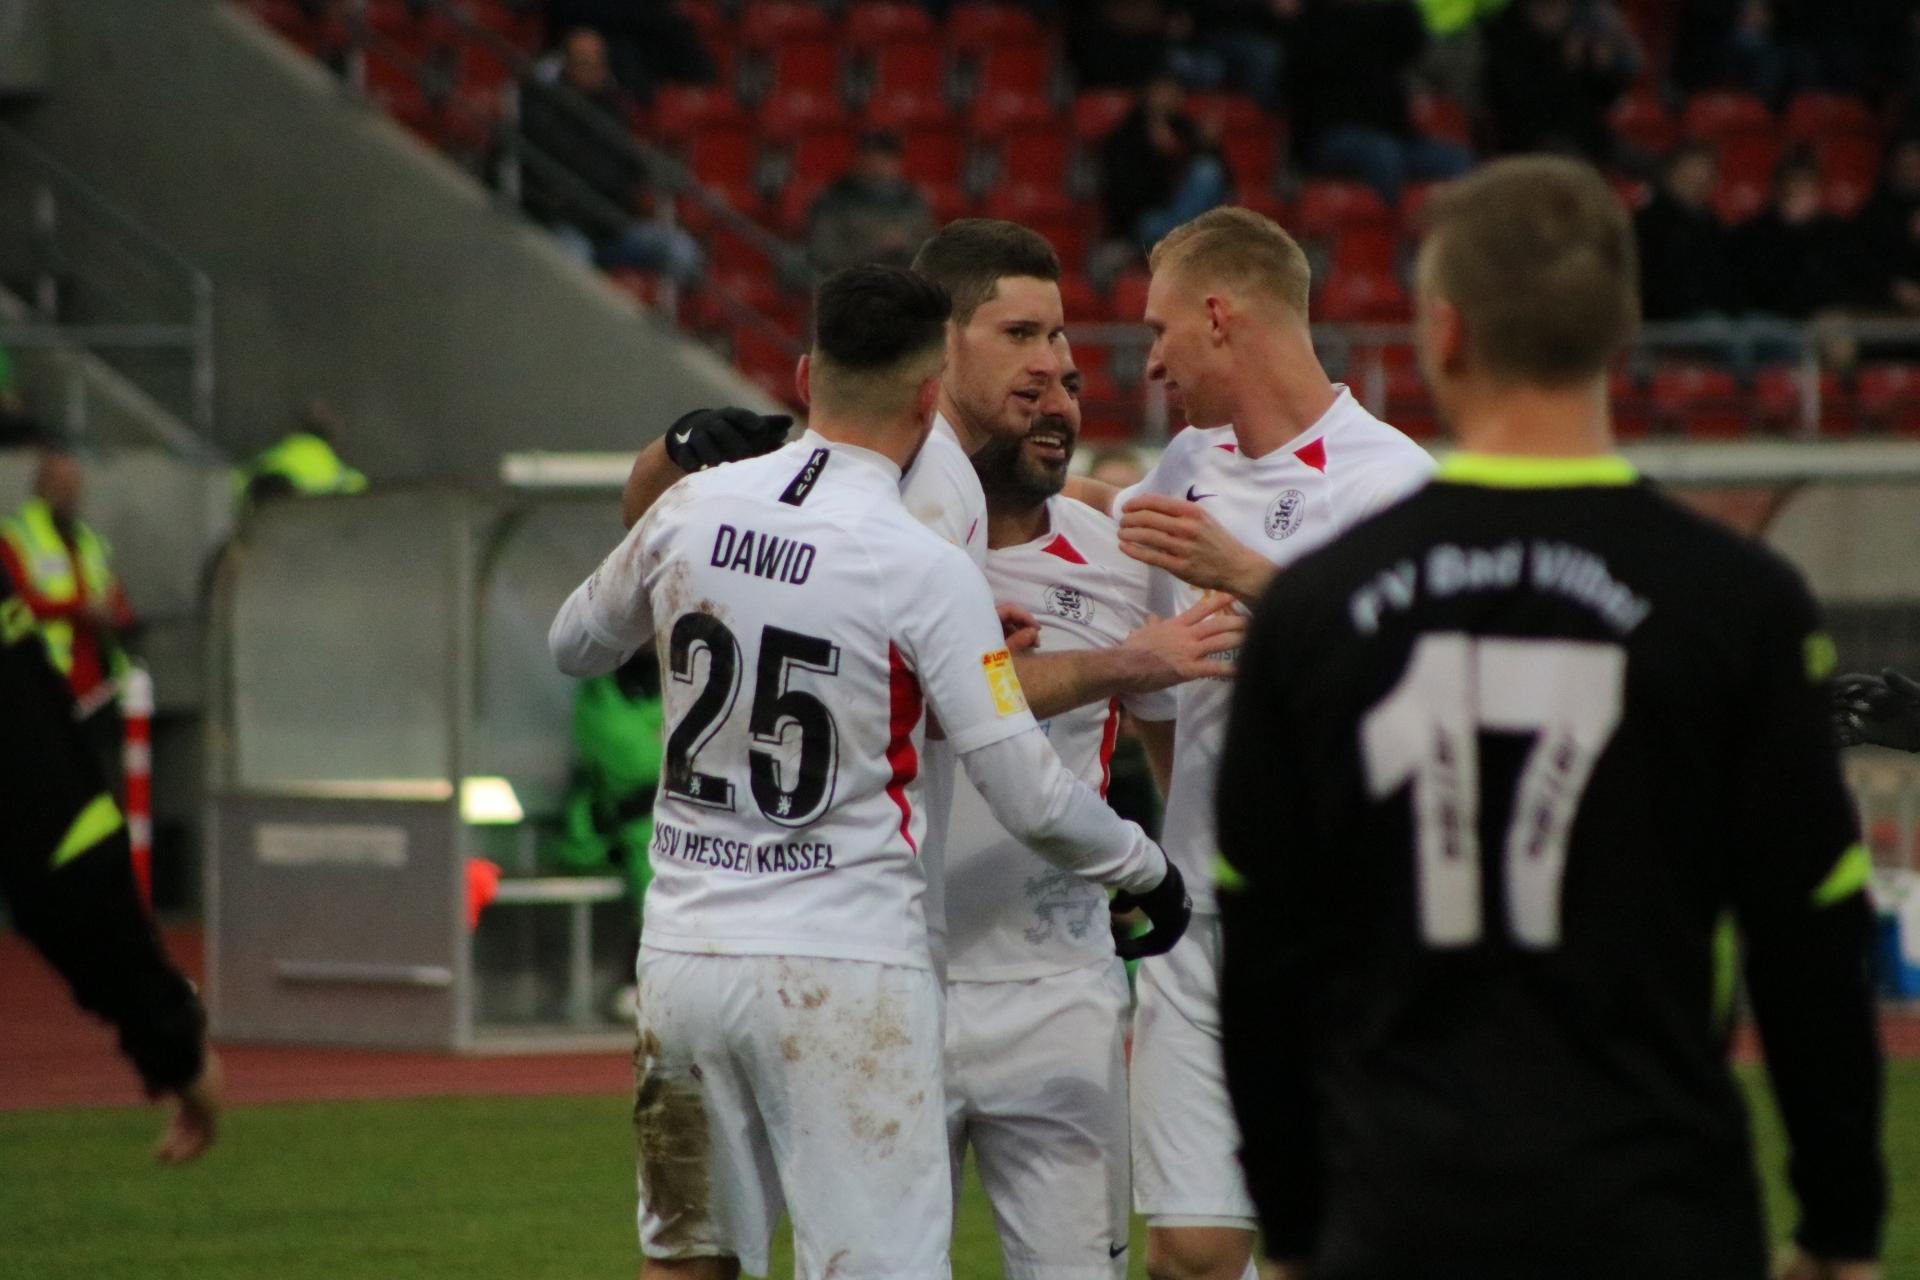 Lotto Hessenliga 2019/2020, KSV Hessen Kassel, FV Bad Vilbel, Endstand 6:1, Jubel zum 5:0 (KSV Hessen Kassel)